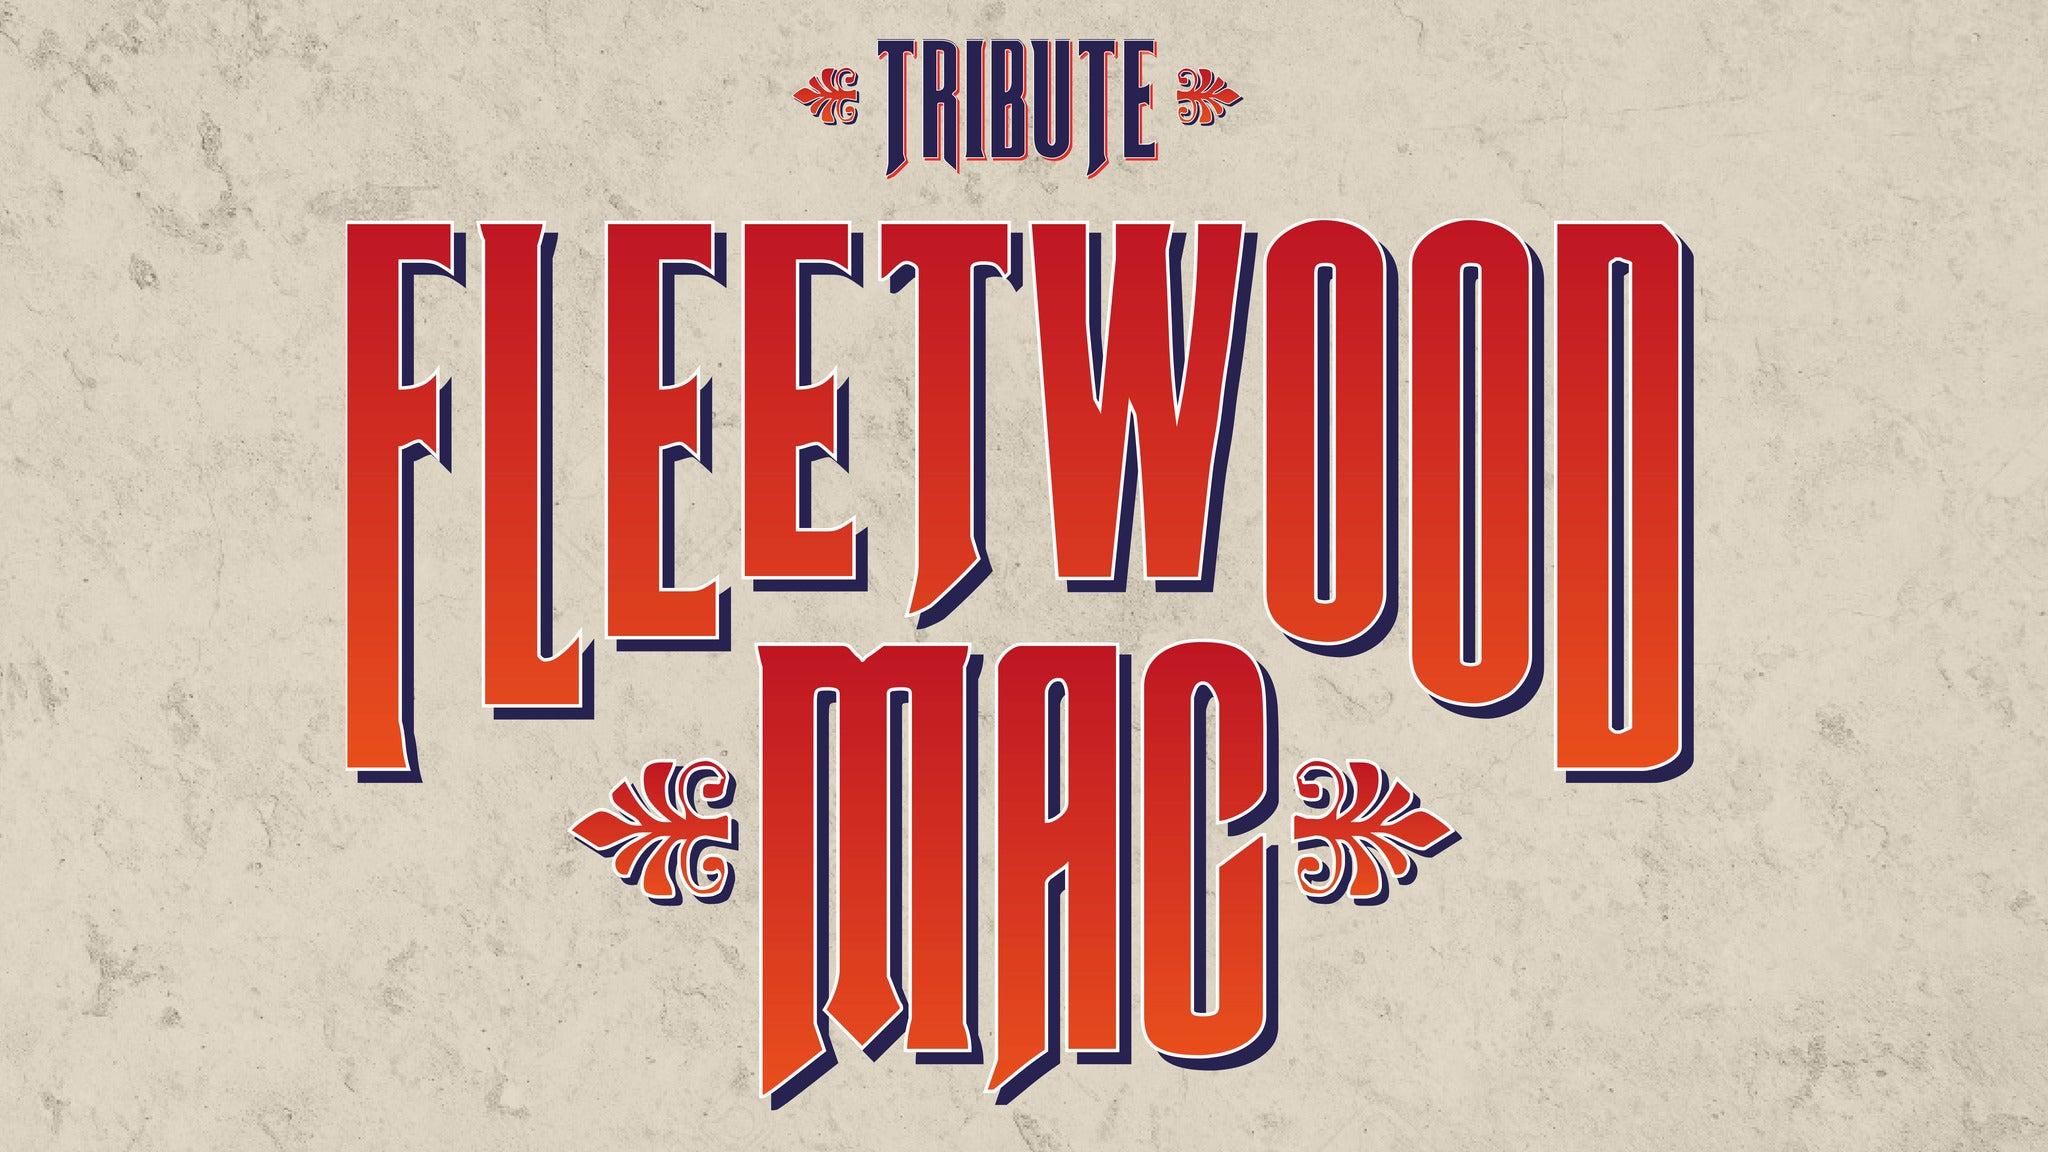 Mirage - Visions Of Fleetwood Mac